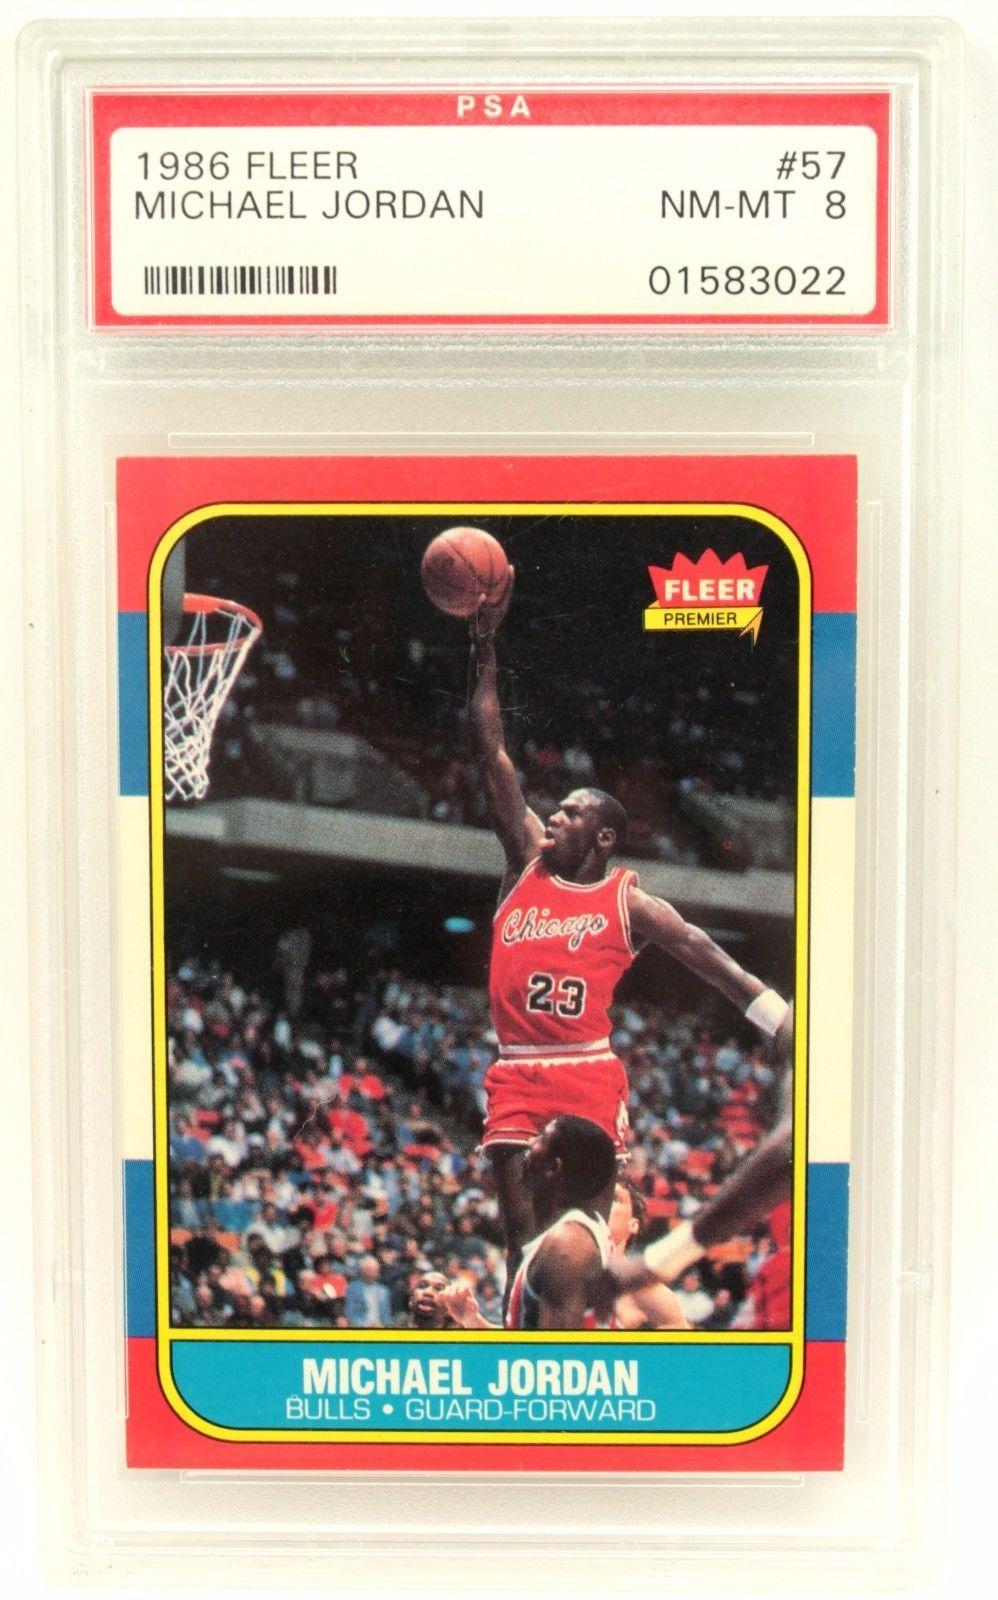 1986 fleer michael jordan rookie card 57 psa 8 graded